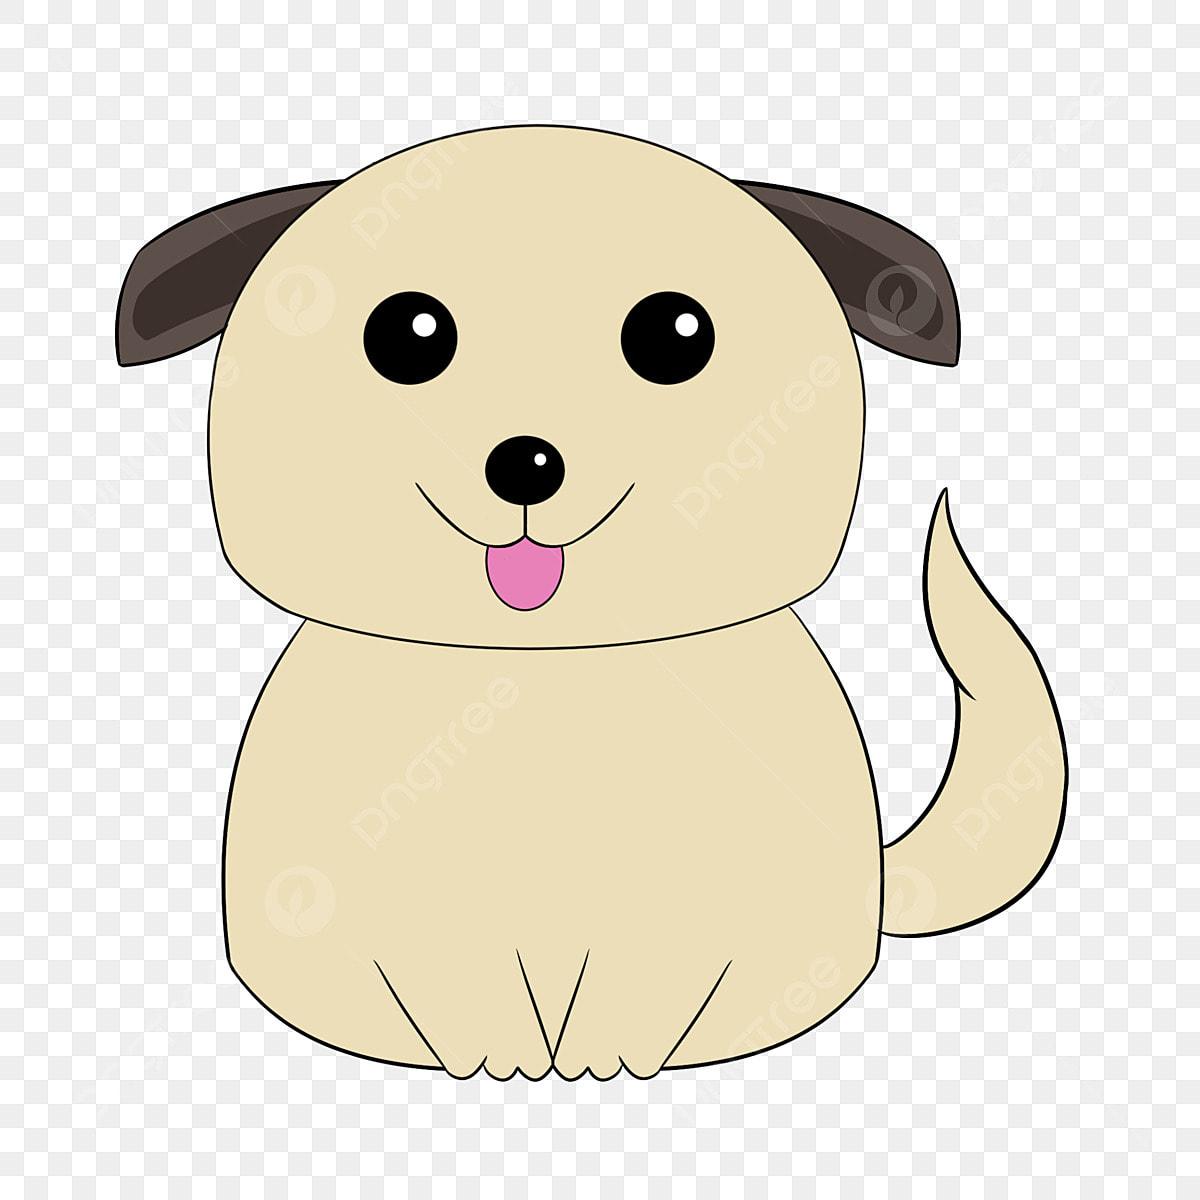 Cartoon Dog Material Vector Cartoon Dog Cartoon Cute Cute Cartoon Png Transparent Clipart Image And Psd File For Free Download